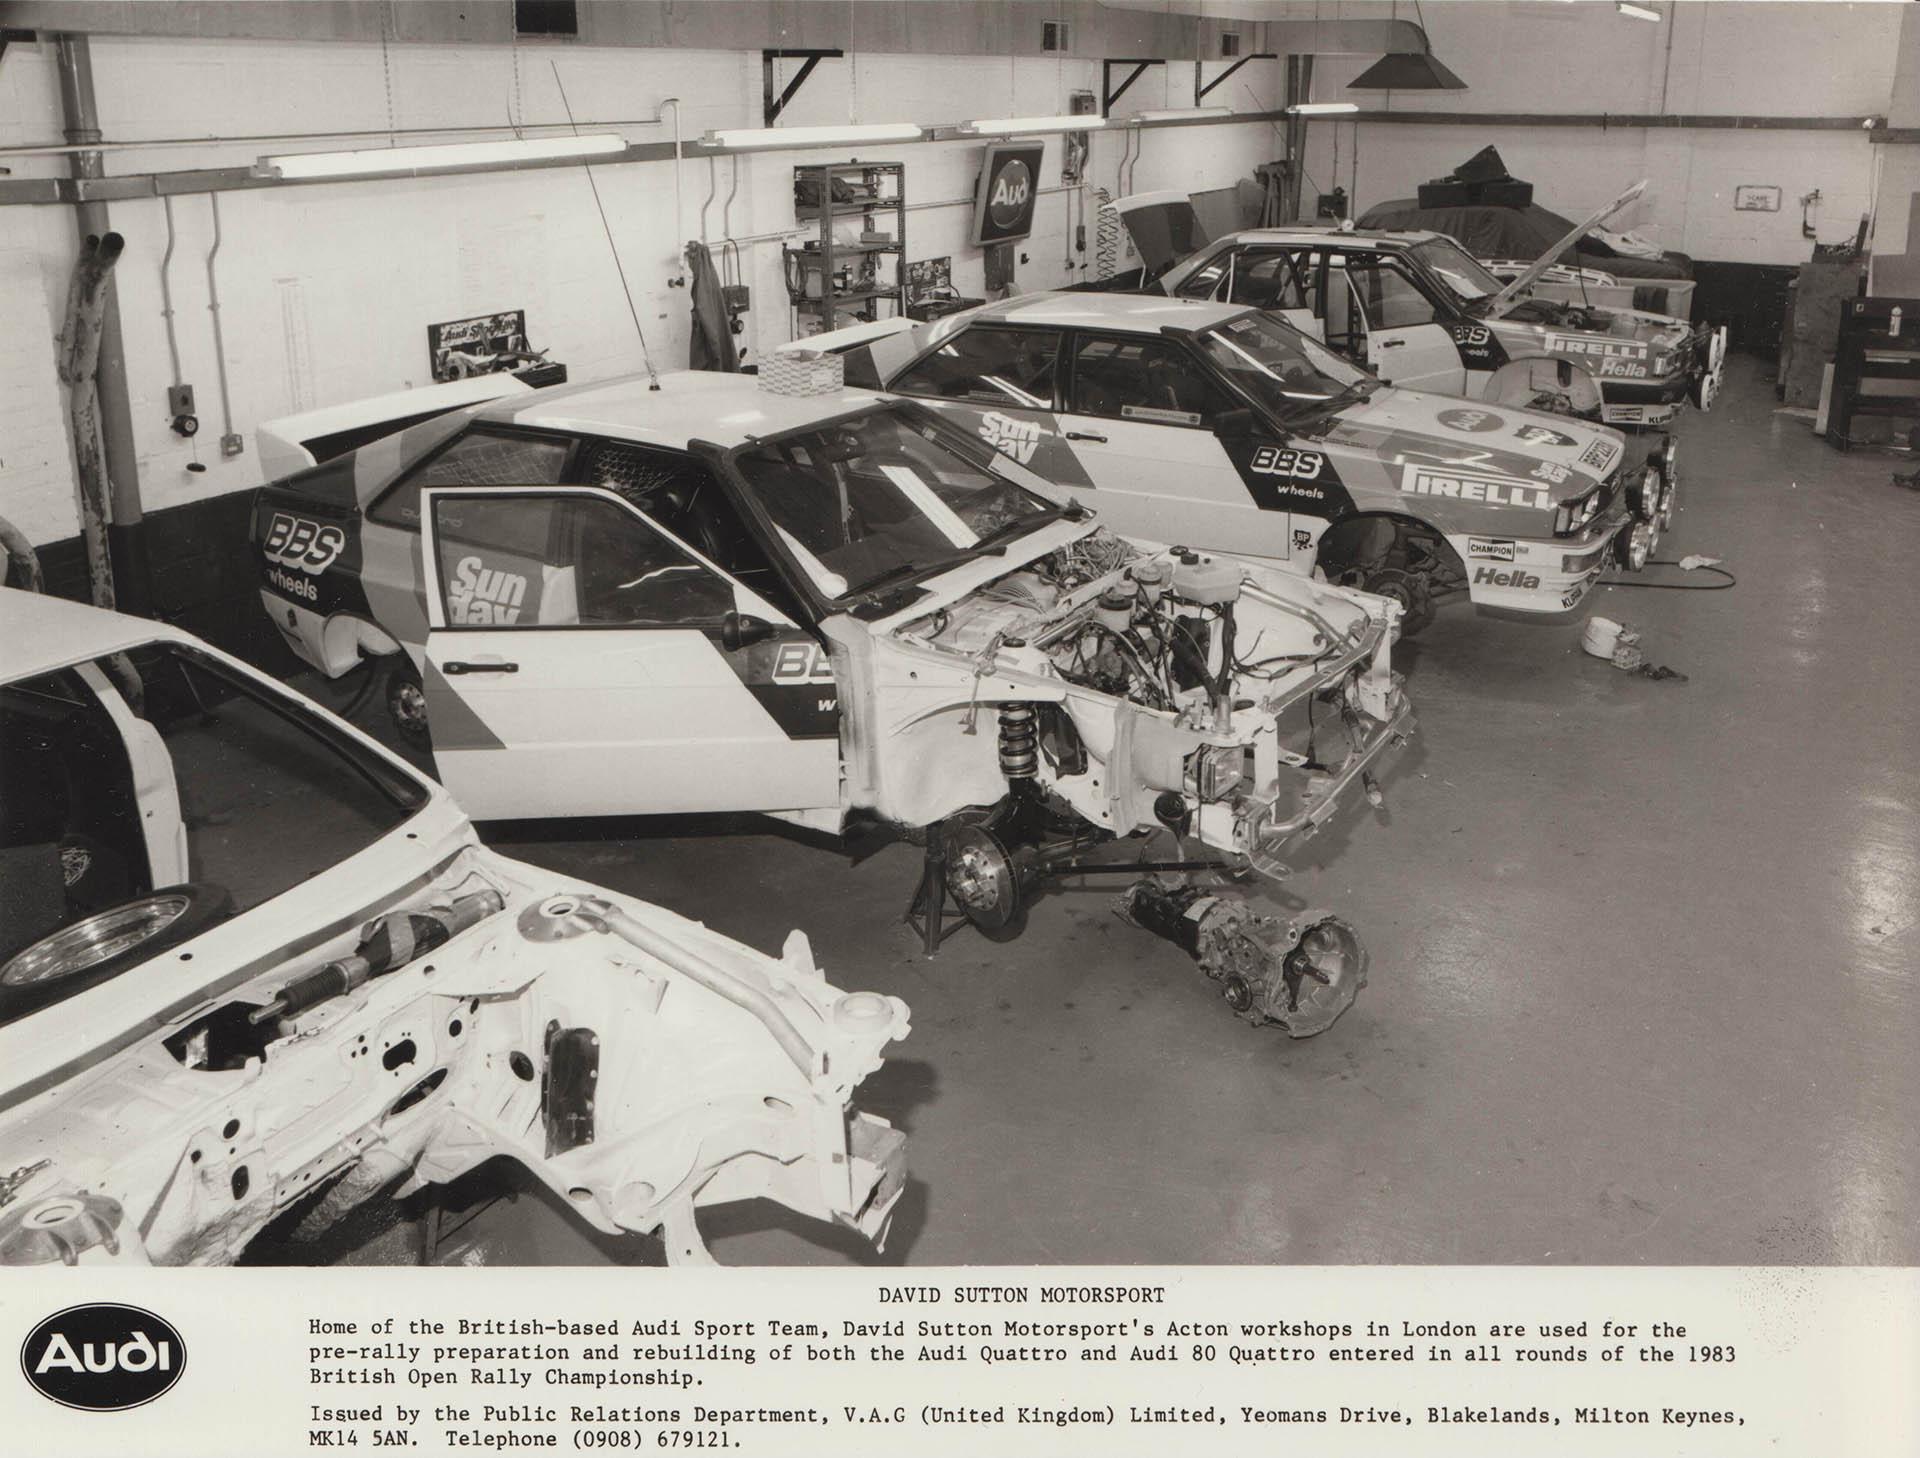 Audi Sport UK Press Release 02/03/1983